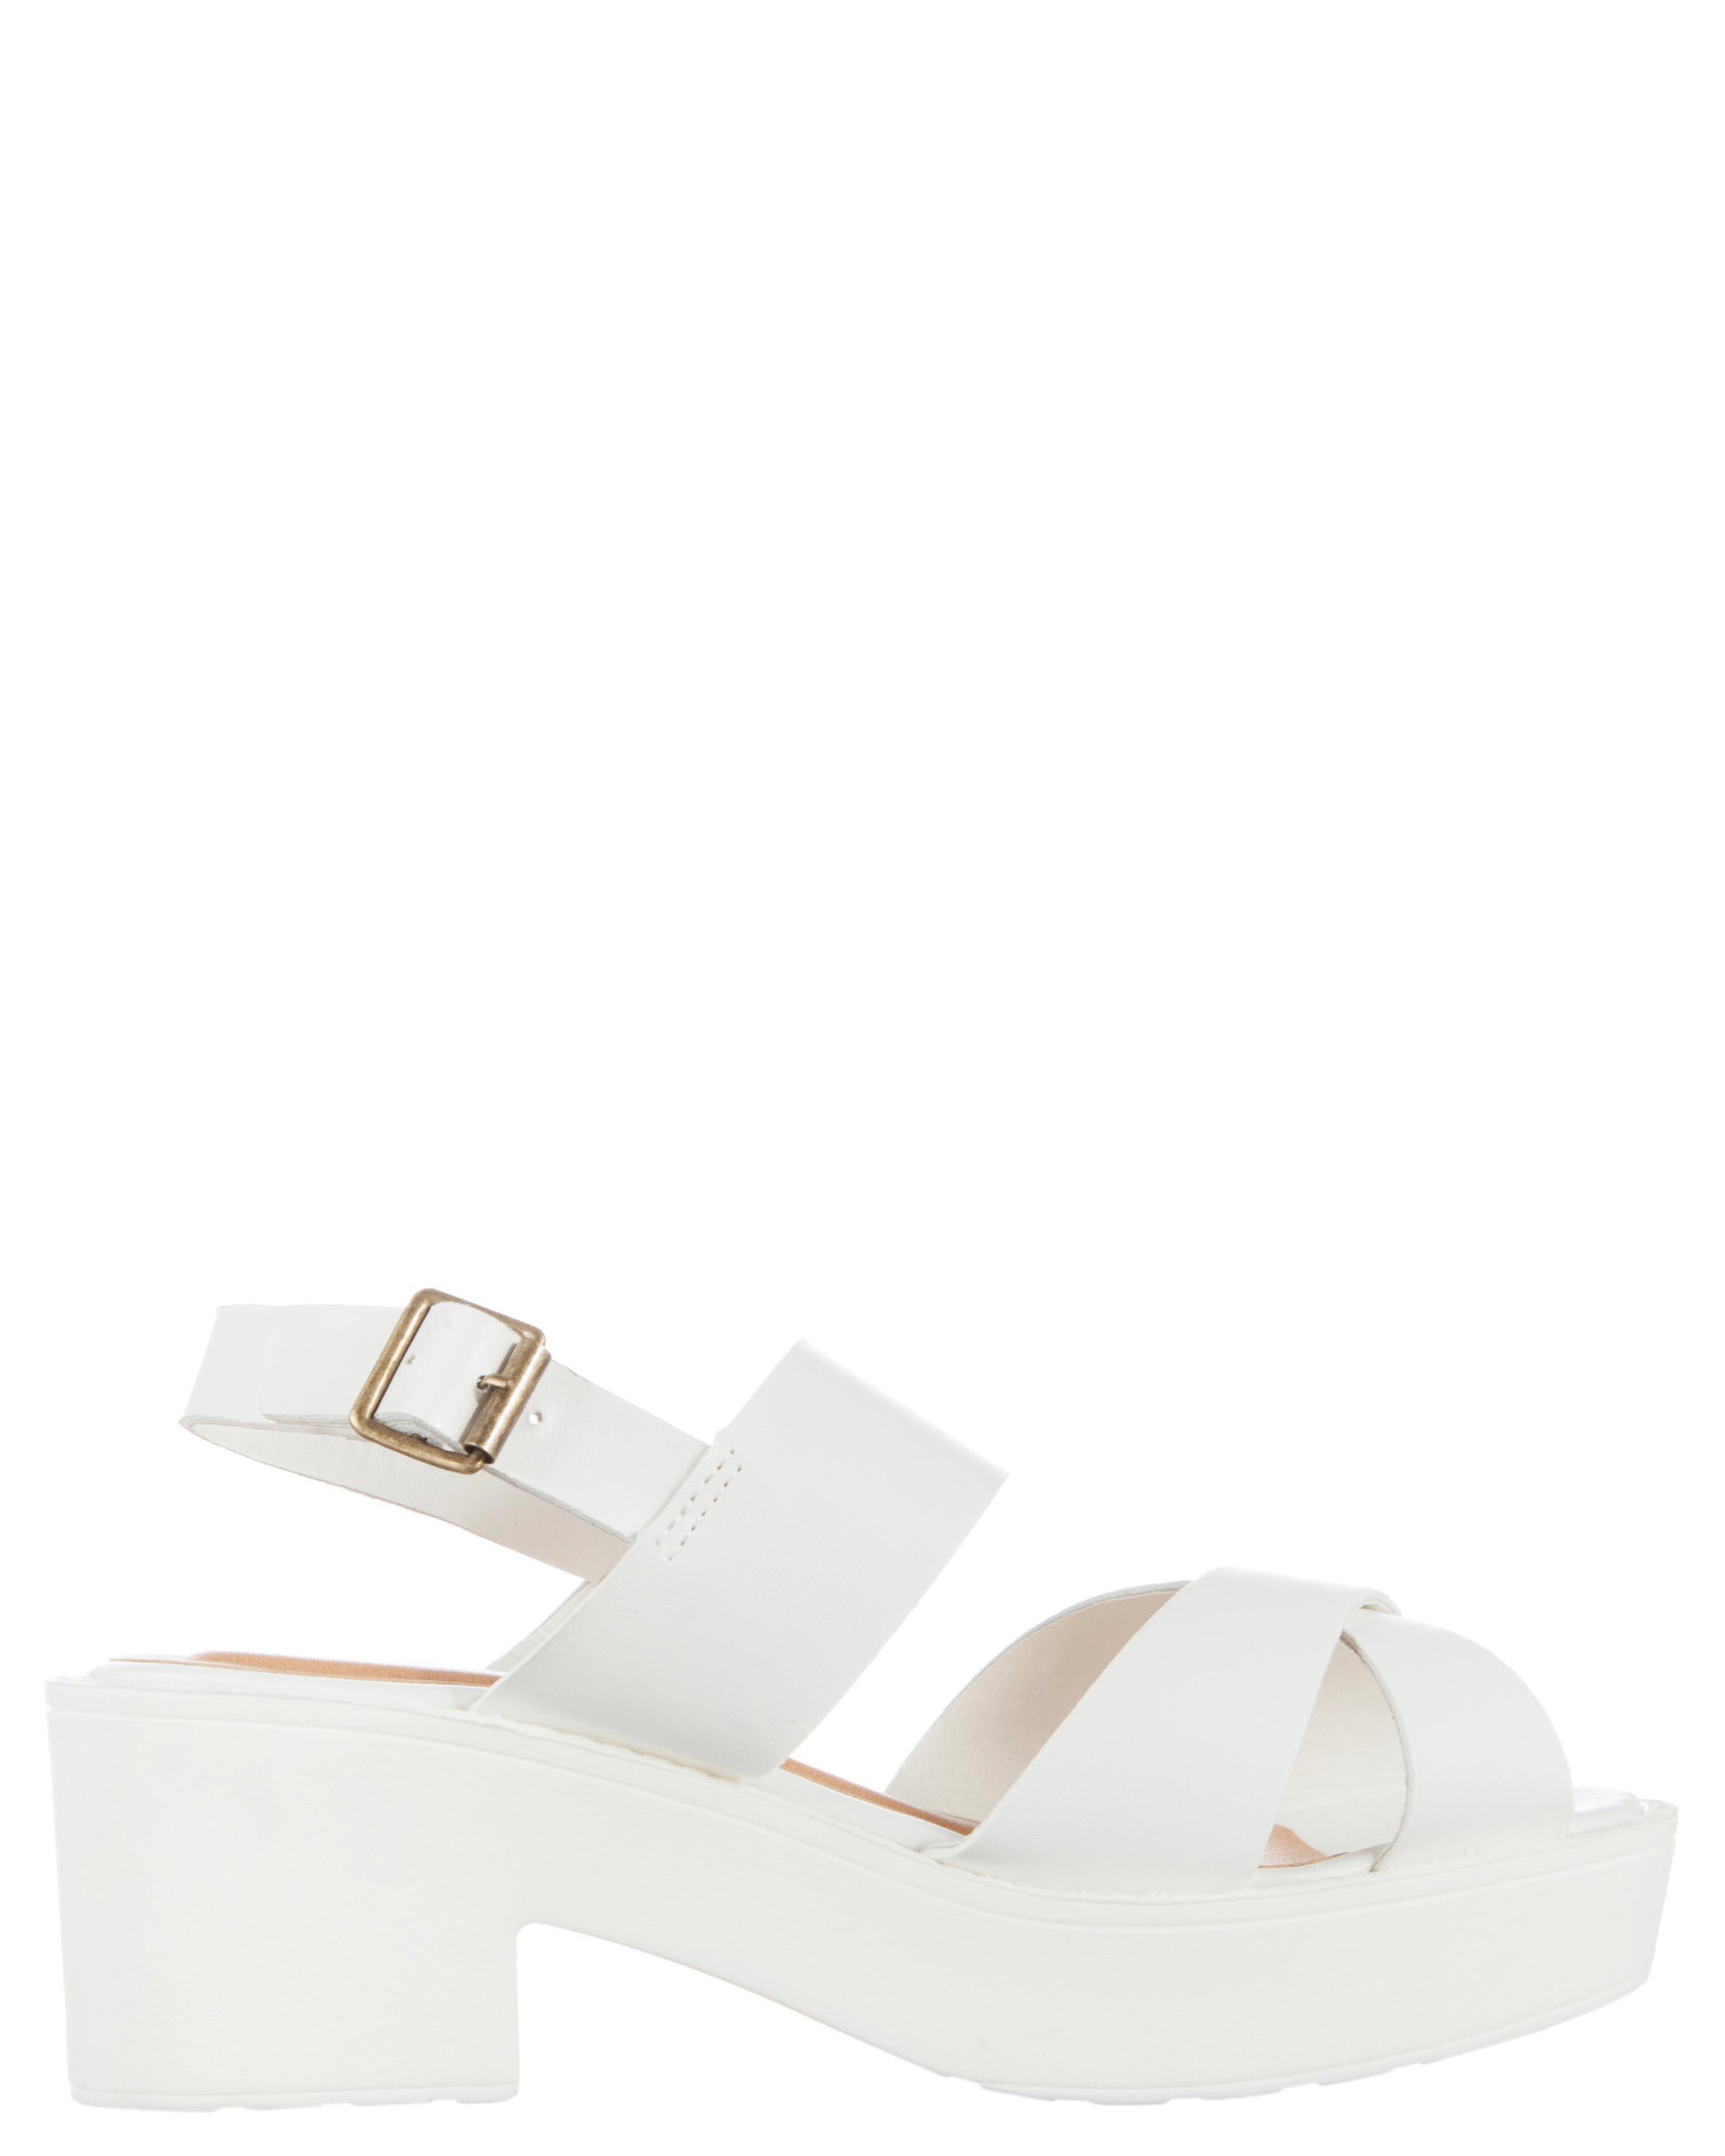 Shoes 5 polyvore